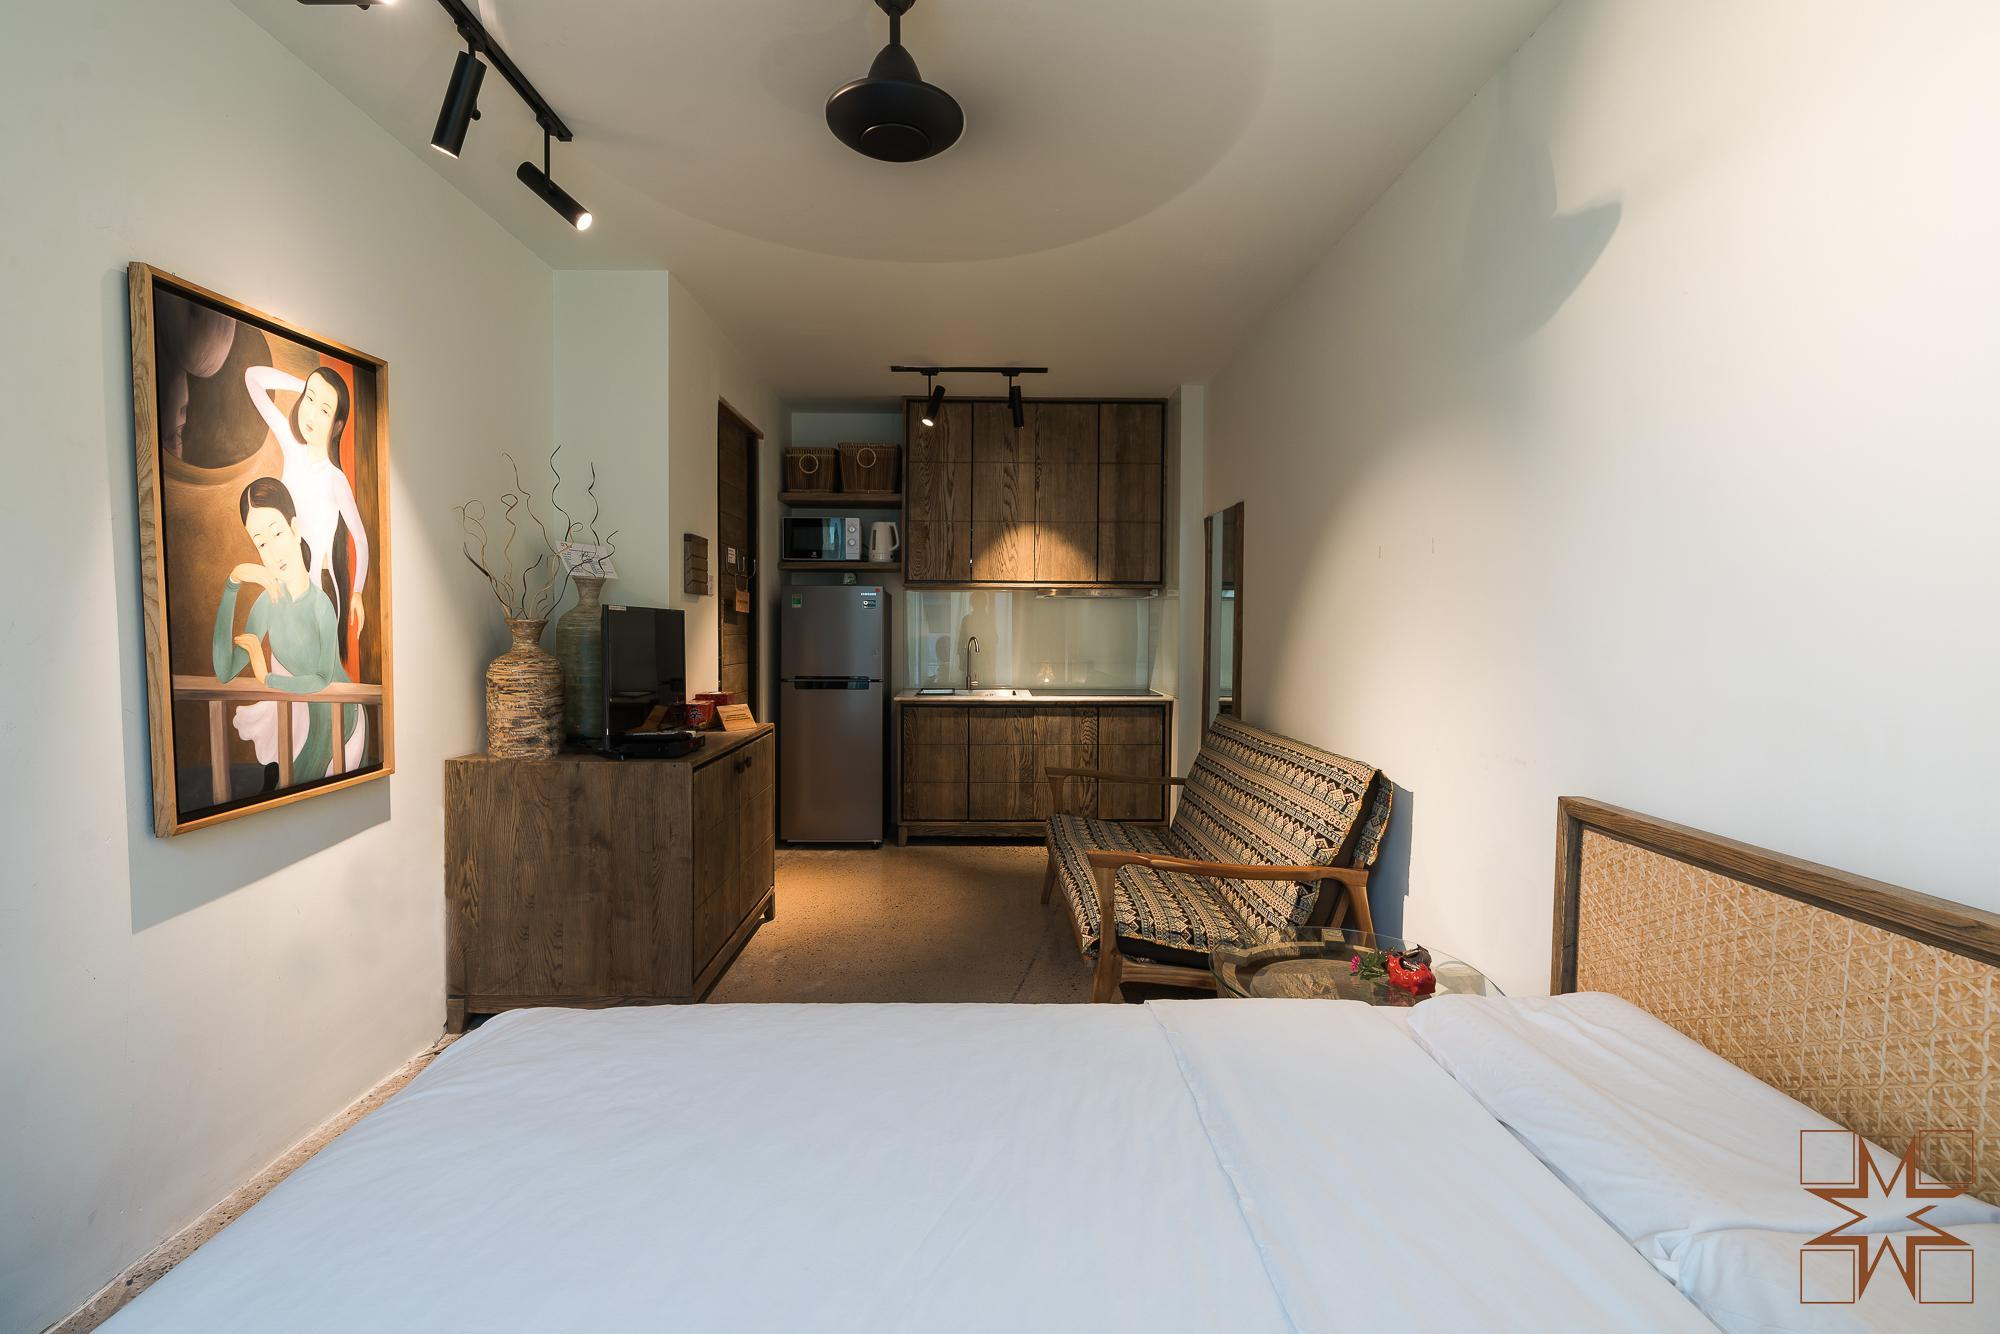 Vietlife Residence & Hotel